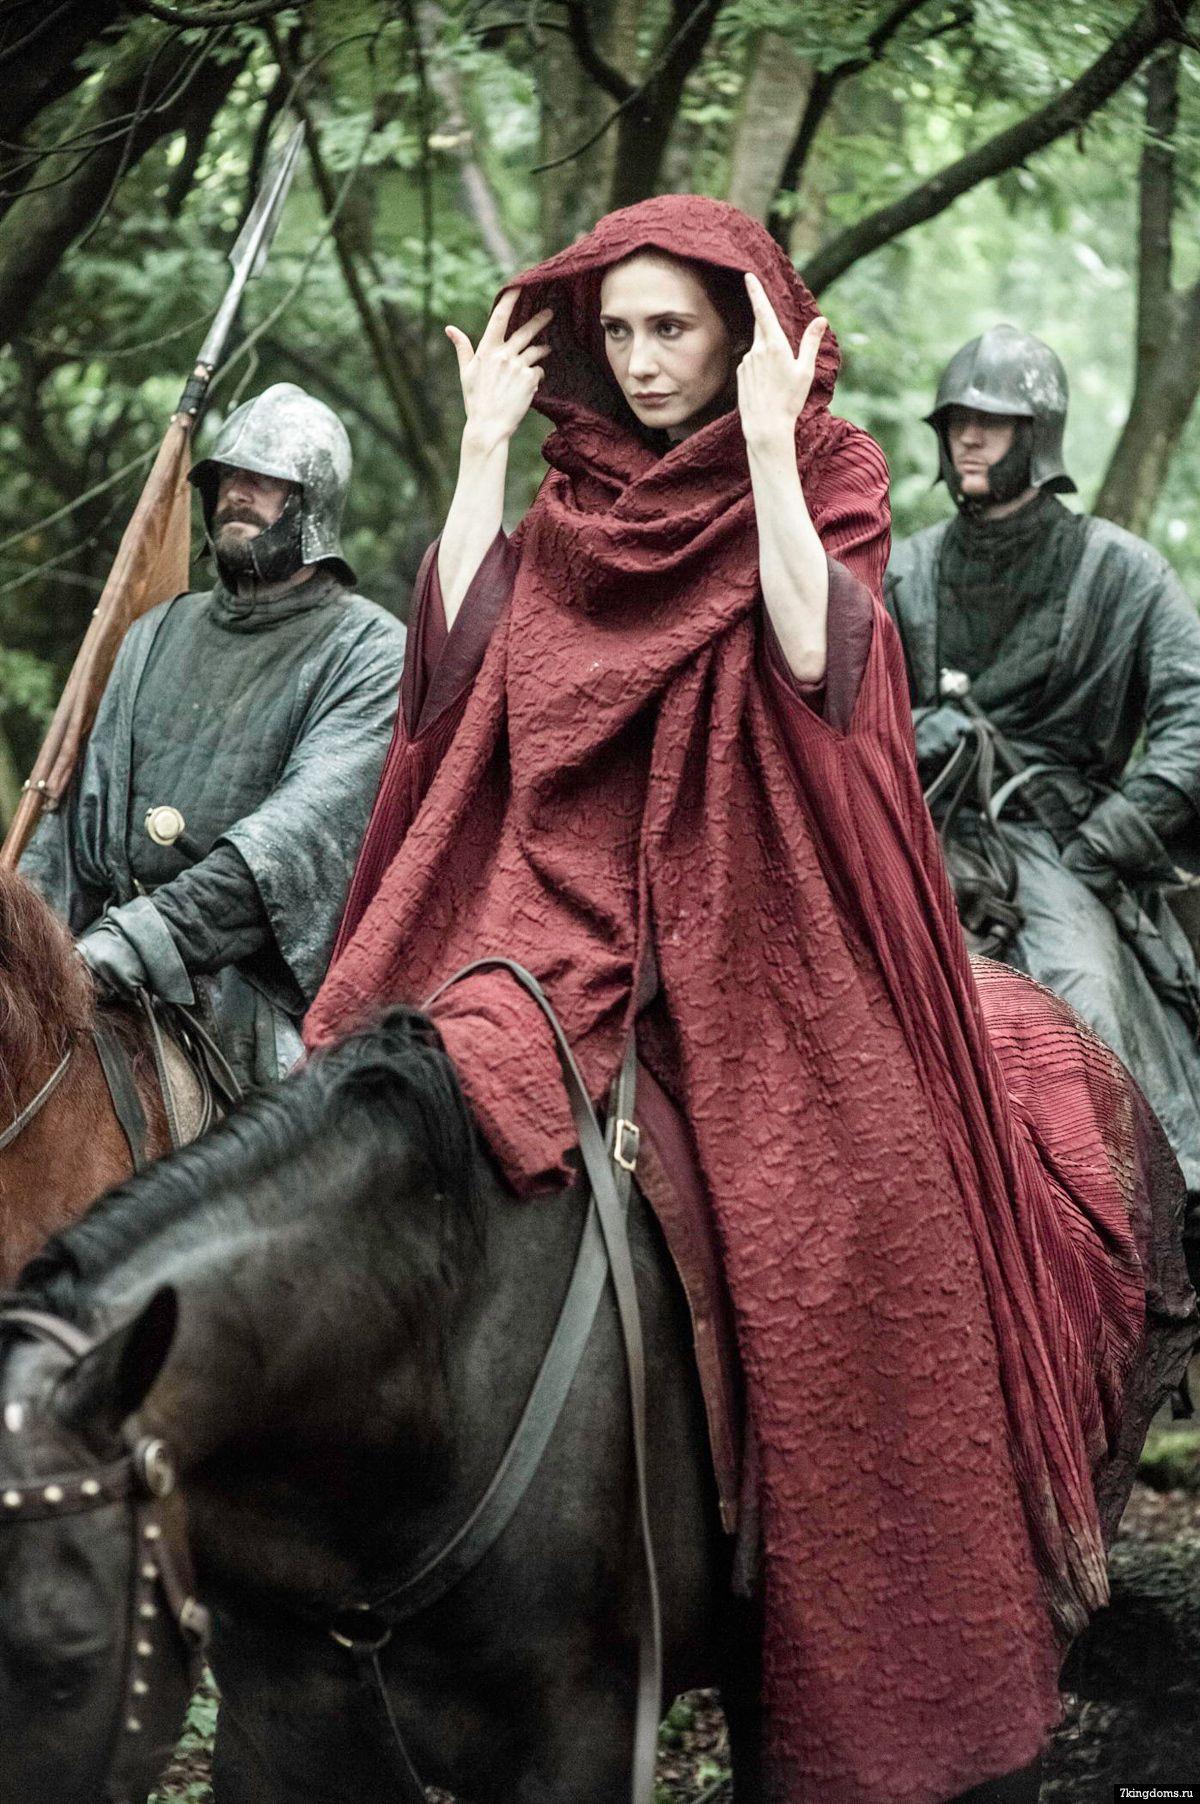 Game of Thrones Episode Still Season 3, episode 8